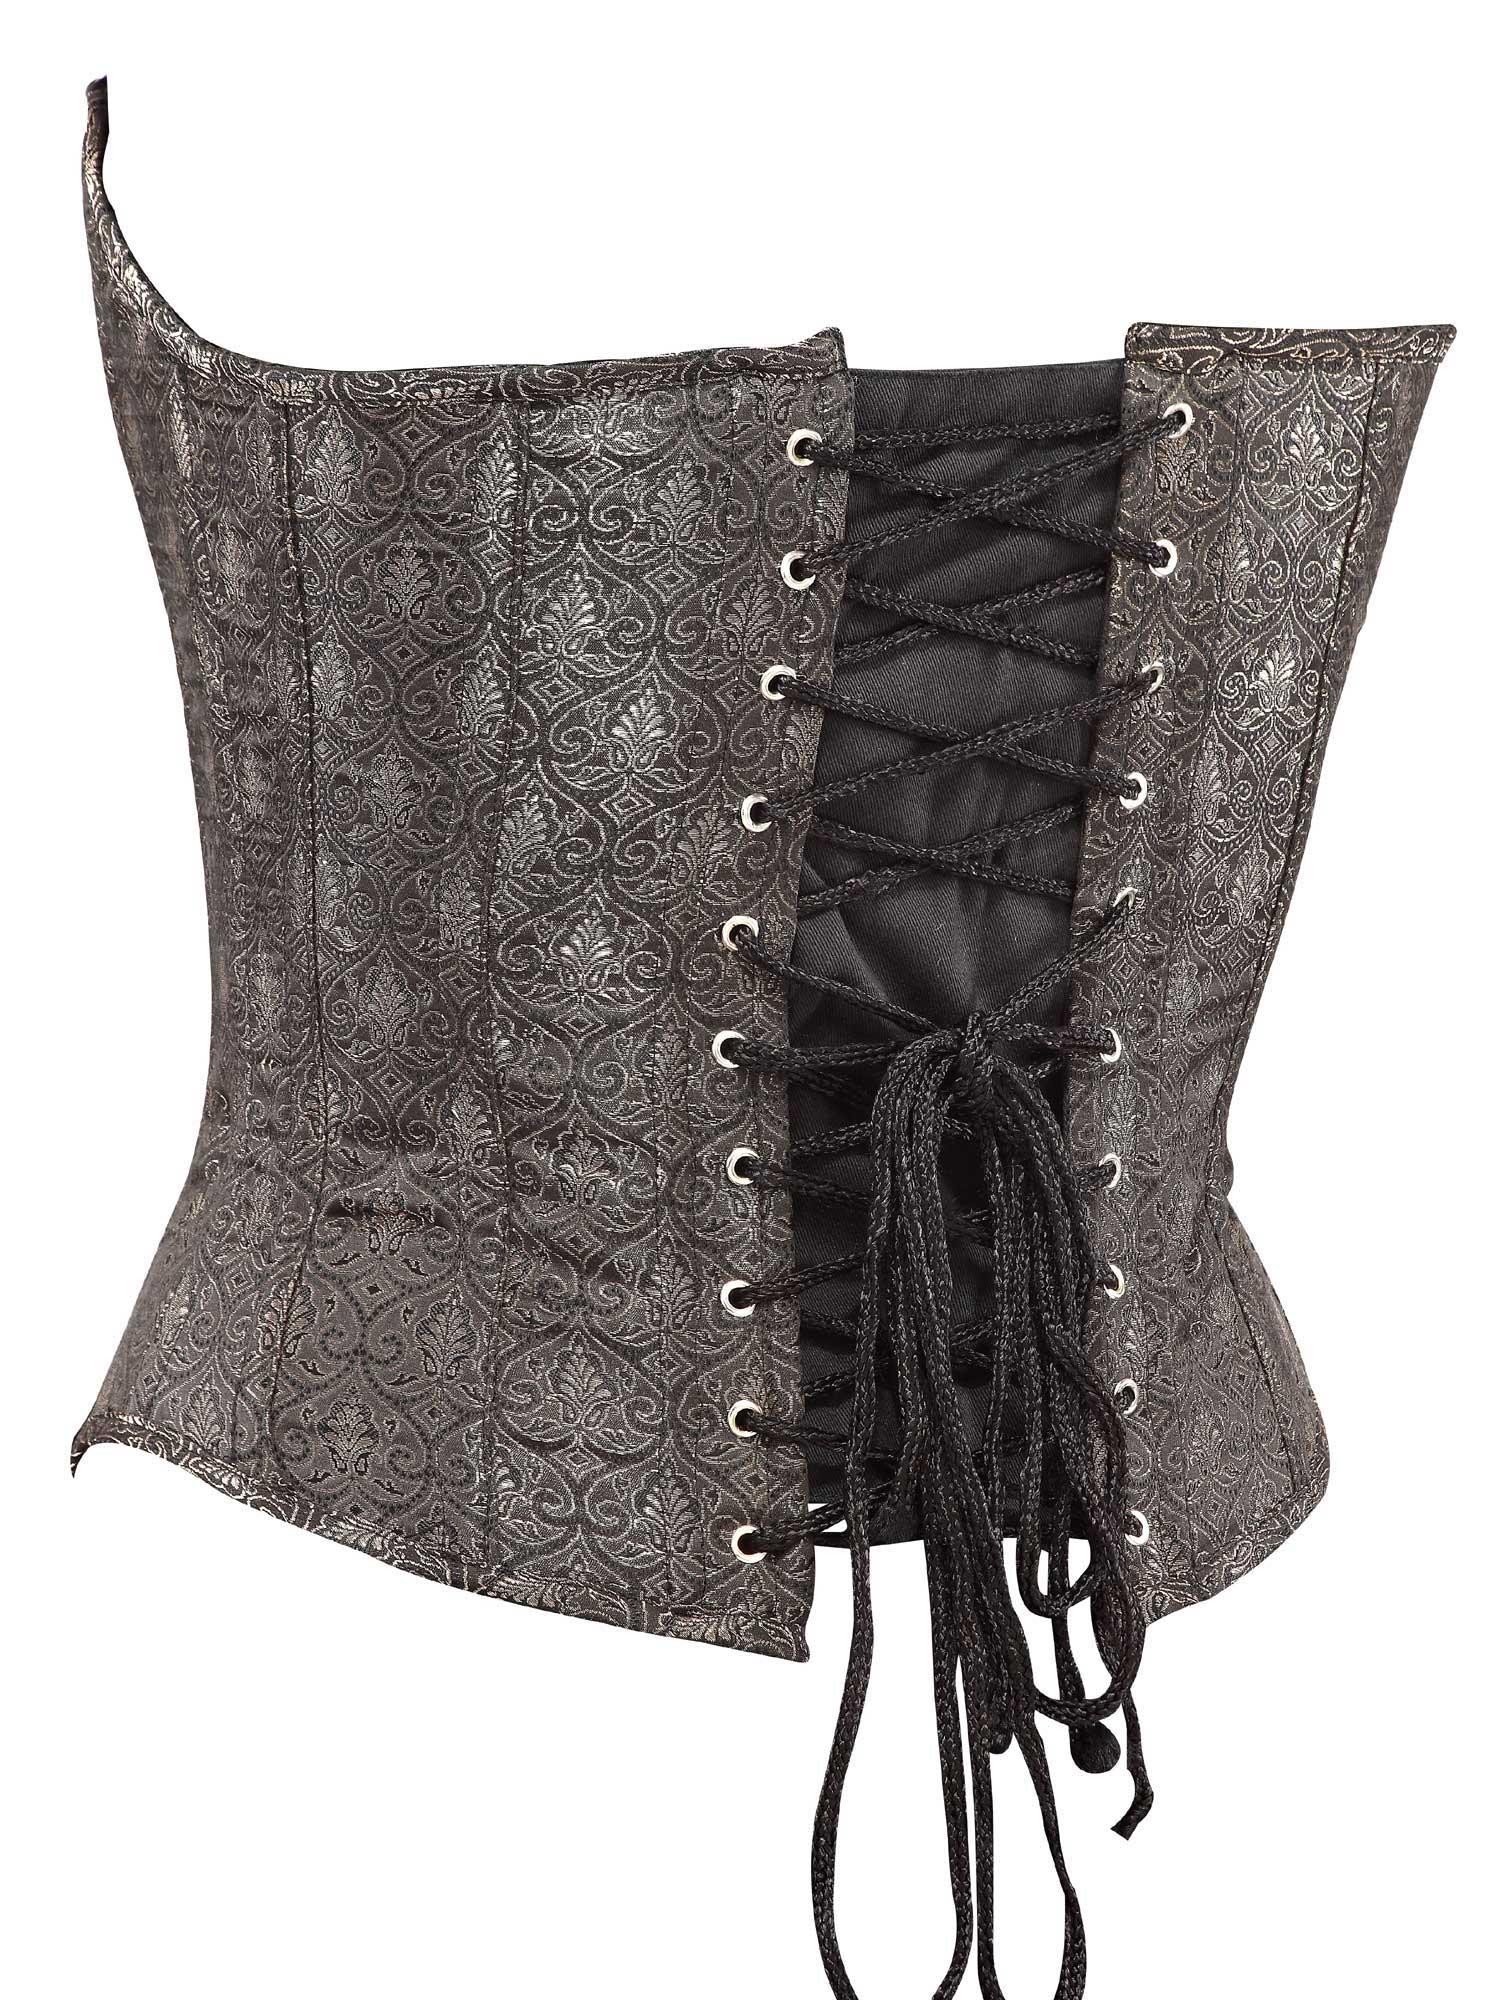 brown_brocade_fabric_steel_boning_corset_waist_cincher_bustier_bustiers_and_corsets_3.jpg